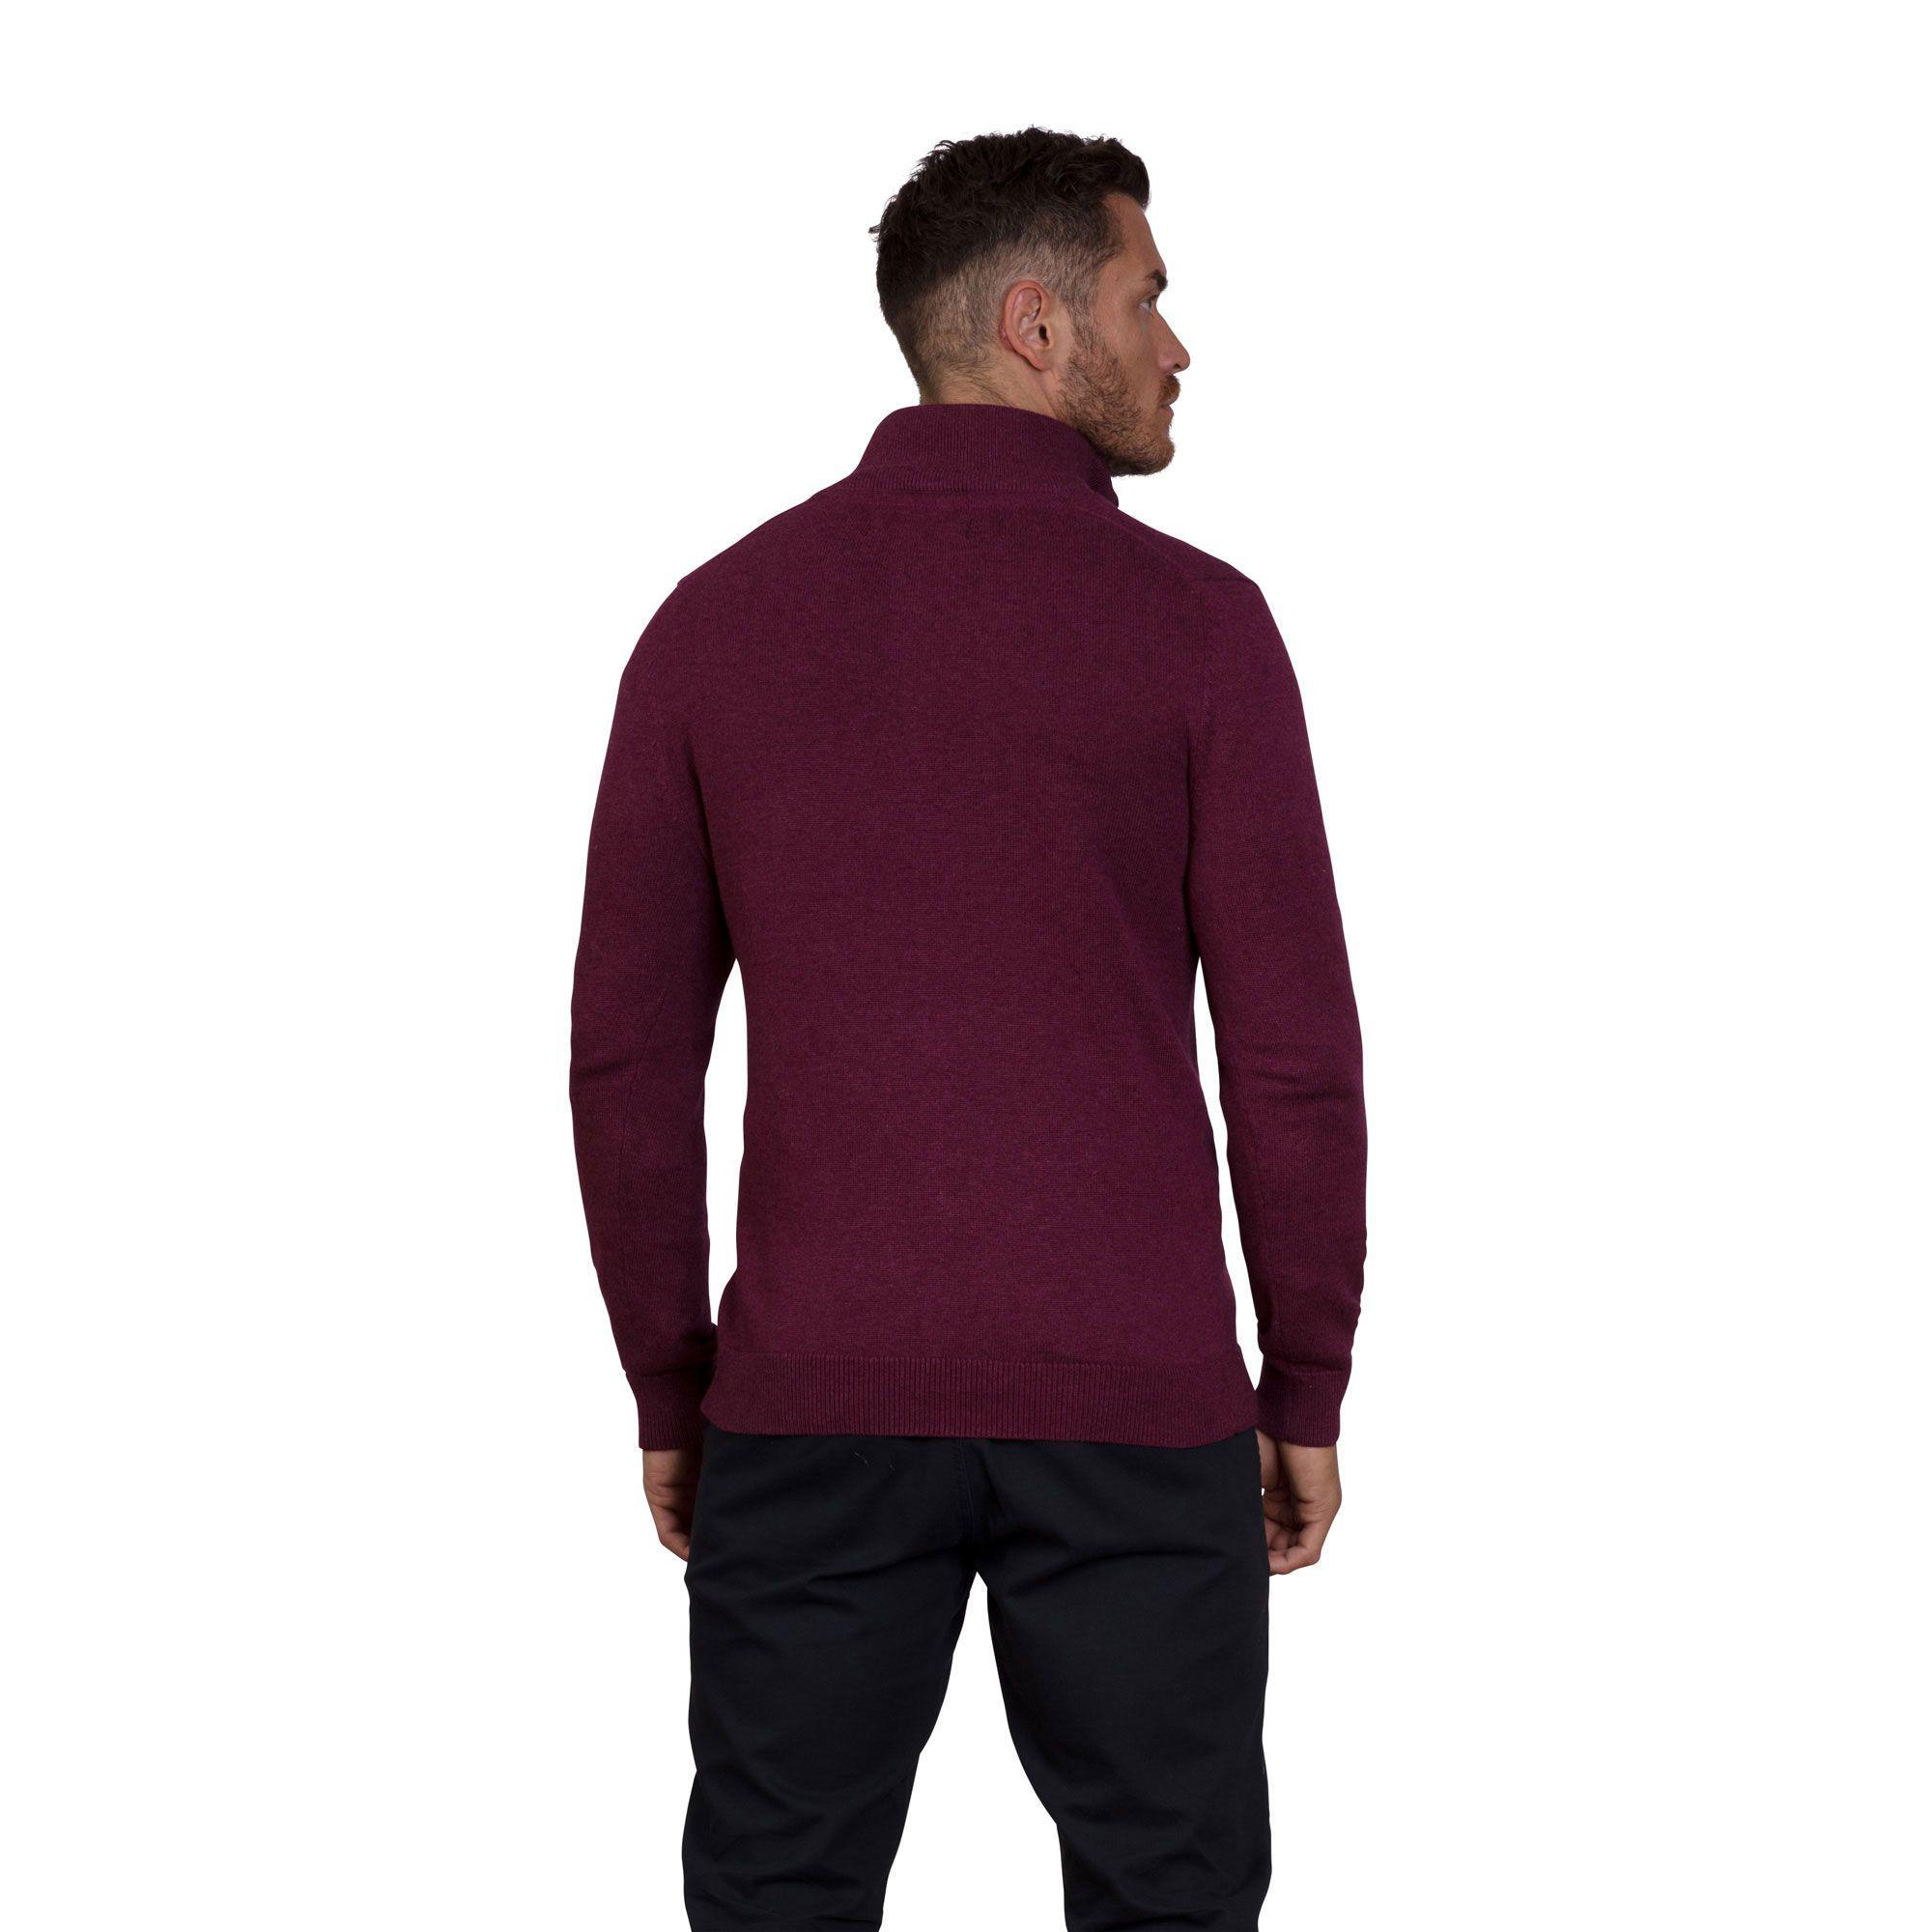 e74b26ef9ca0ac Raging Bull - Red Burgundy Knitted Cotton Cashmere 1/4 Zip Sweater for Men  -. View fullscreen